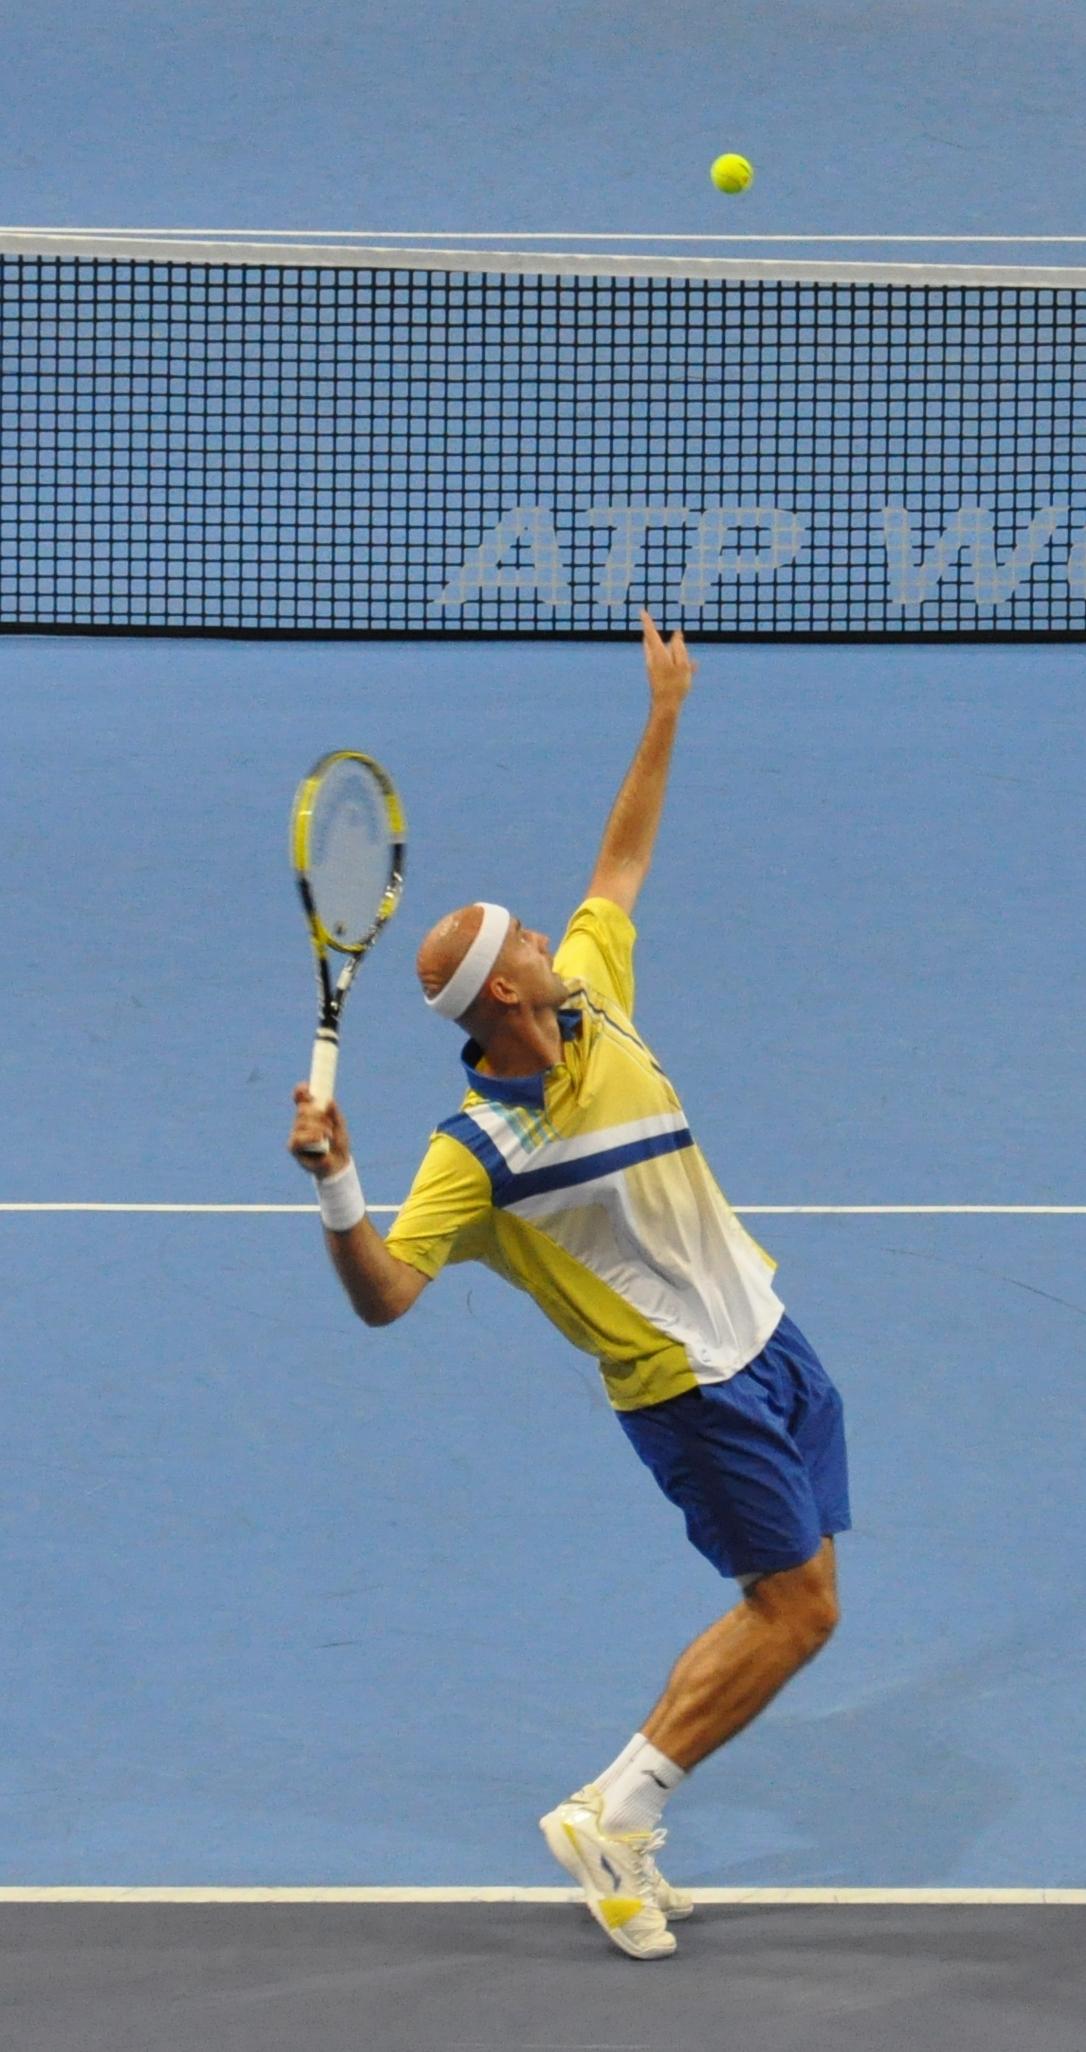 File:Service tennis Ljubicic.jpg Ljubicic Serve